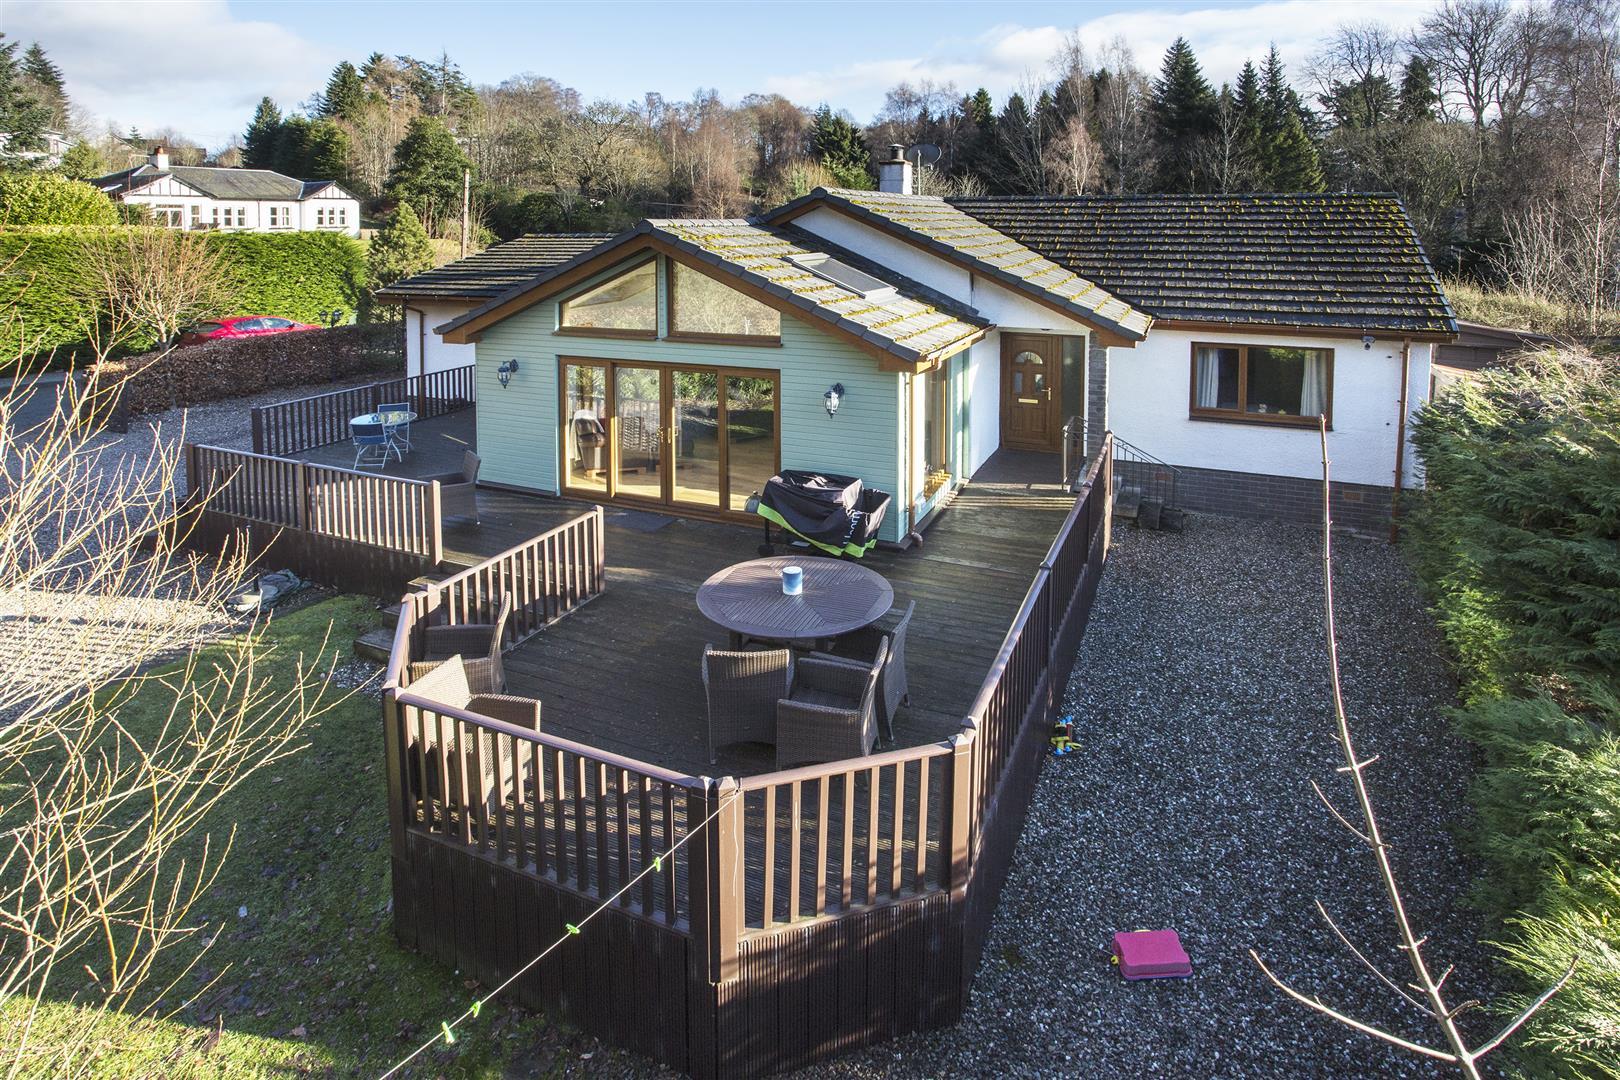 Bracklin, Cuilc Brae, Pitlochry, Perthshire, PH16 5QS, UK